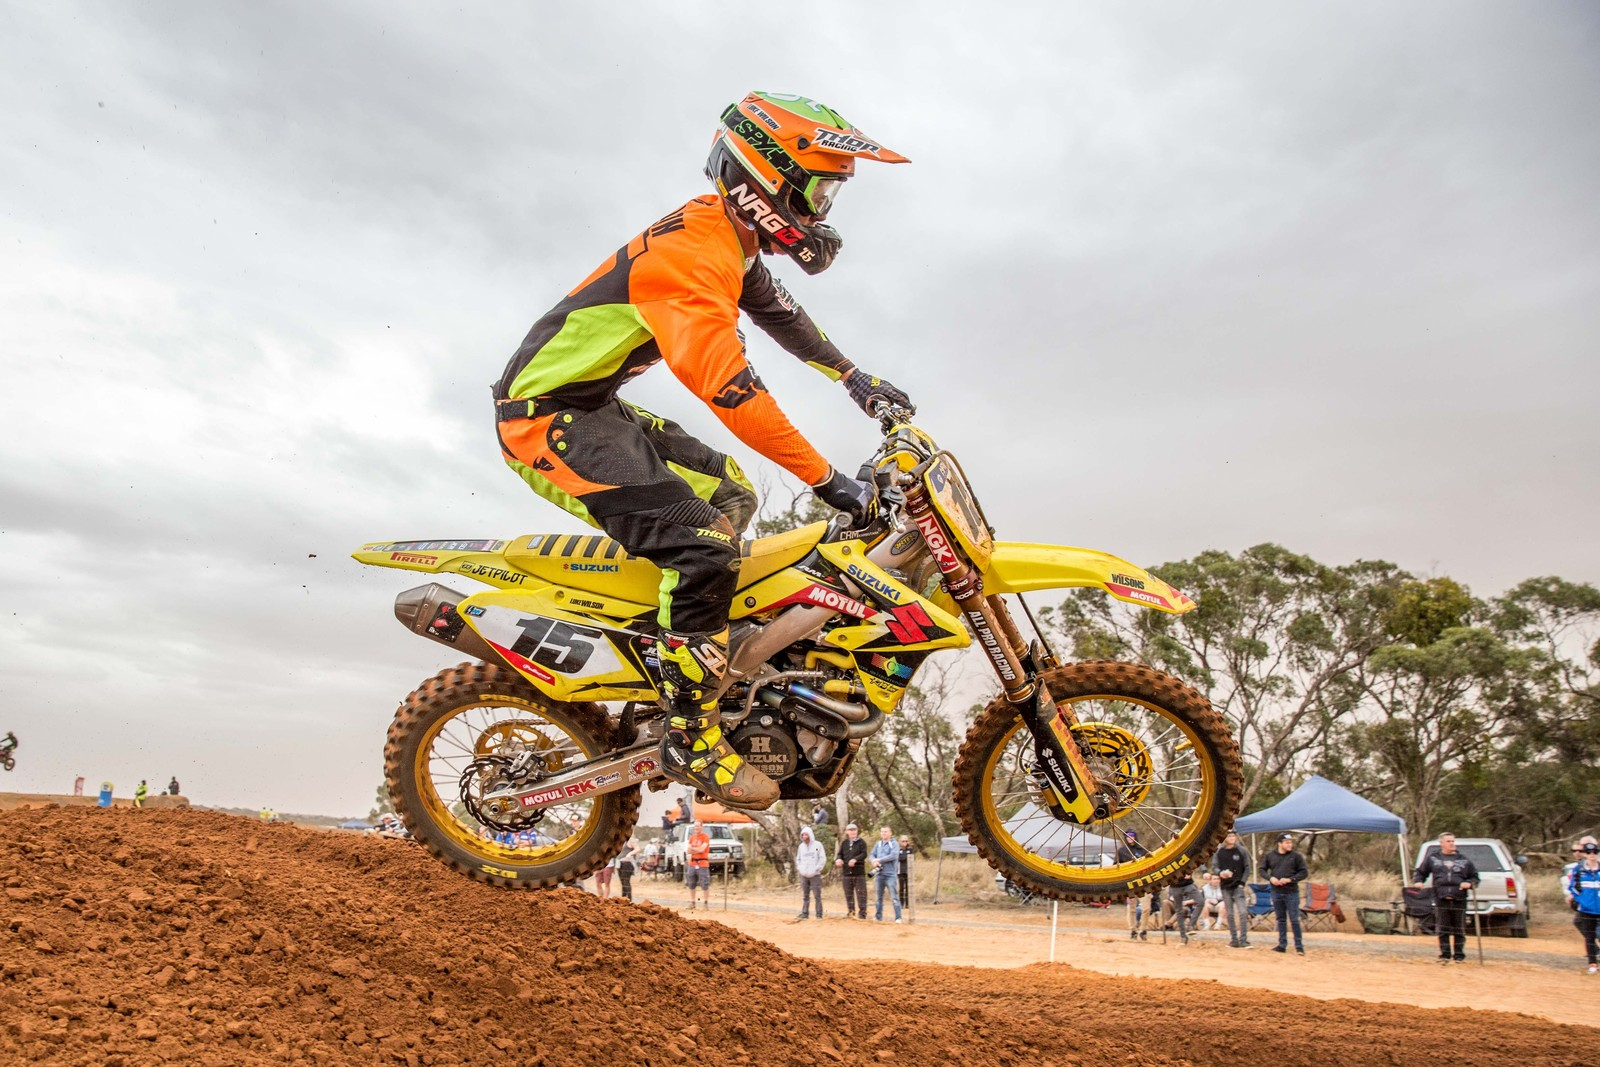 Luke Wilson - Australian Motul Mx Championships: Round 4, Murray Bridge - Motocross Pictures - Vital MX